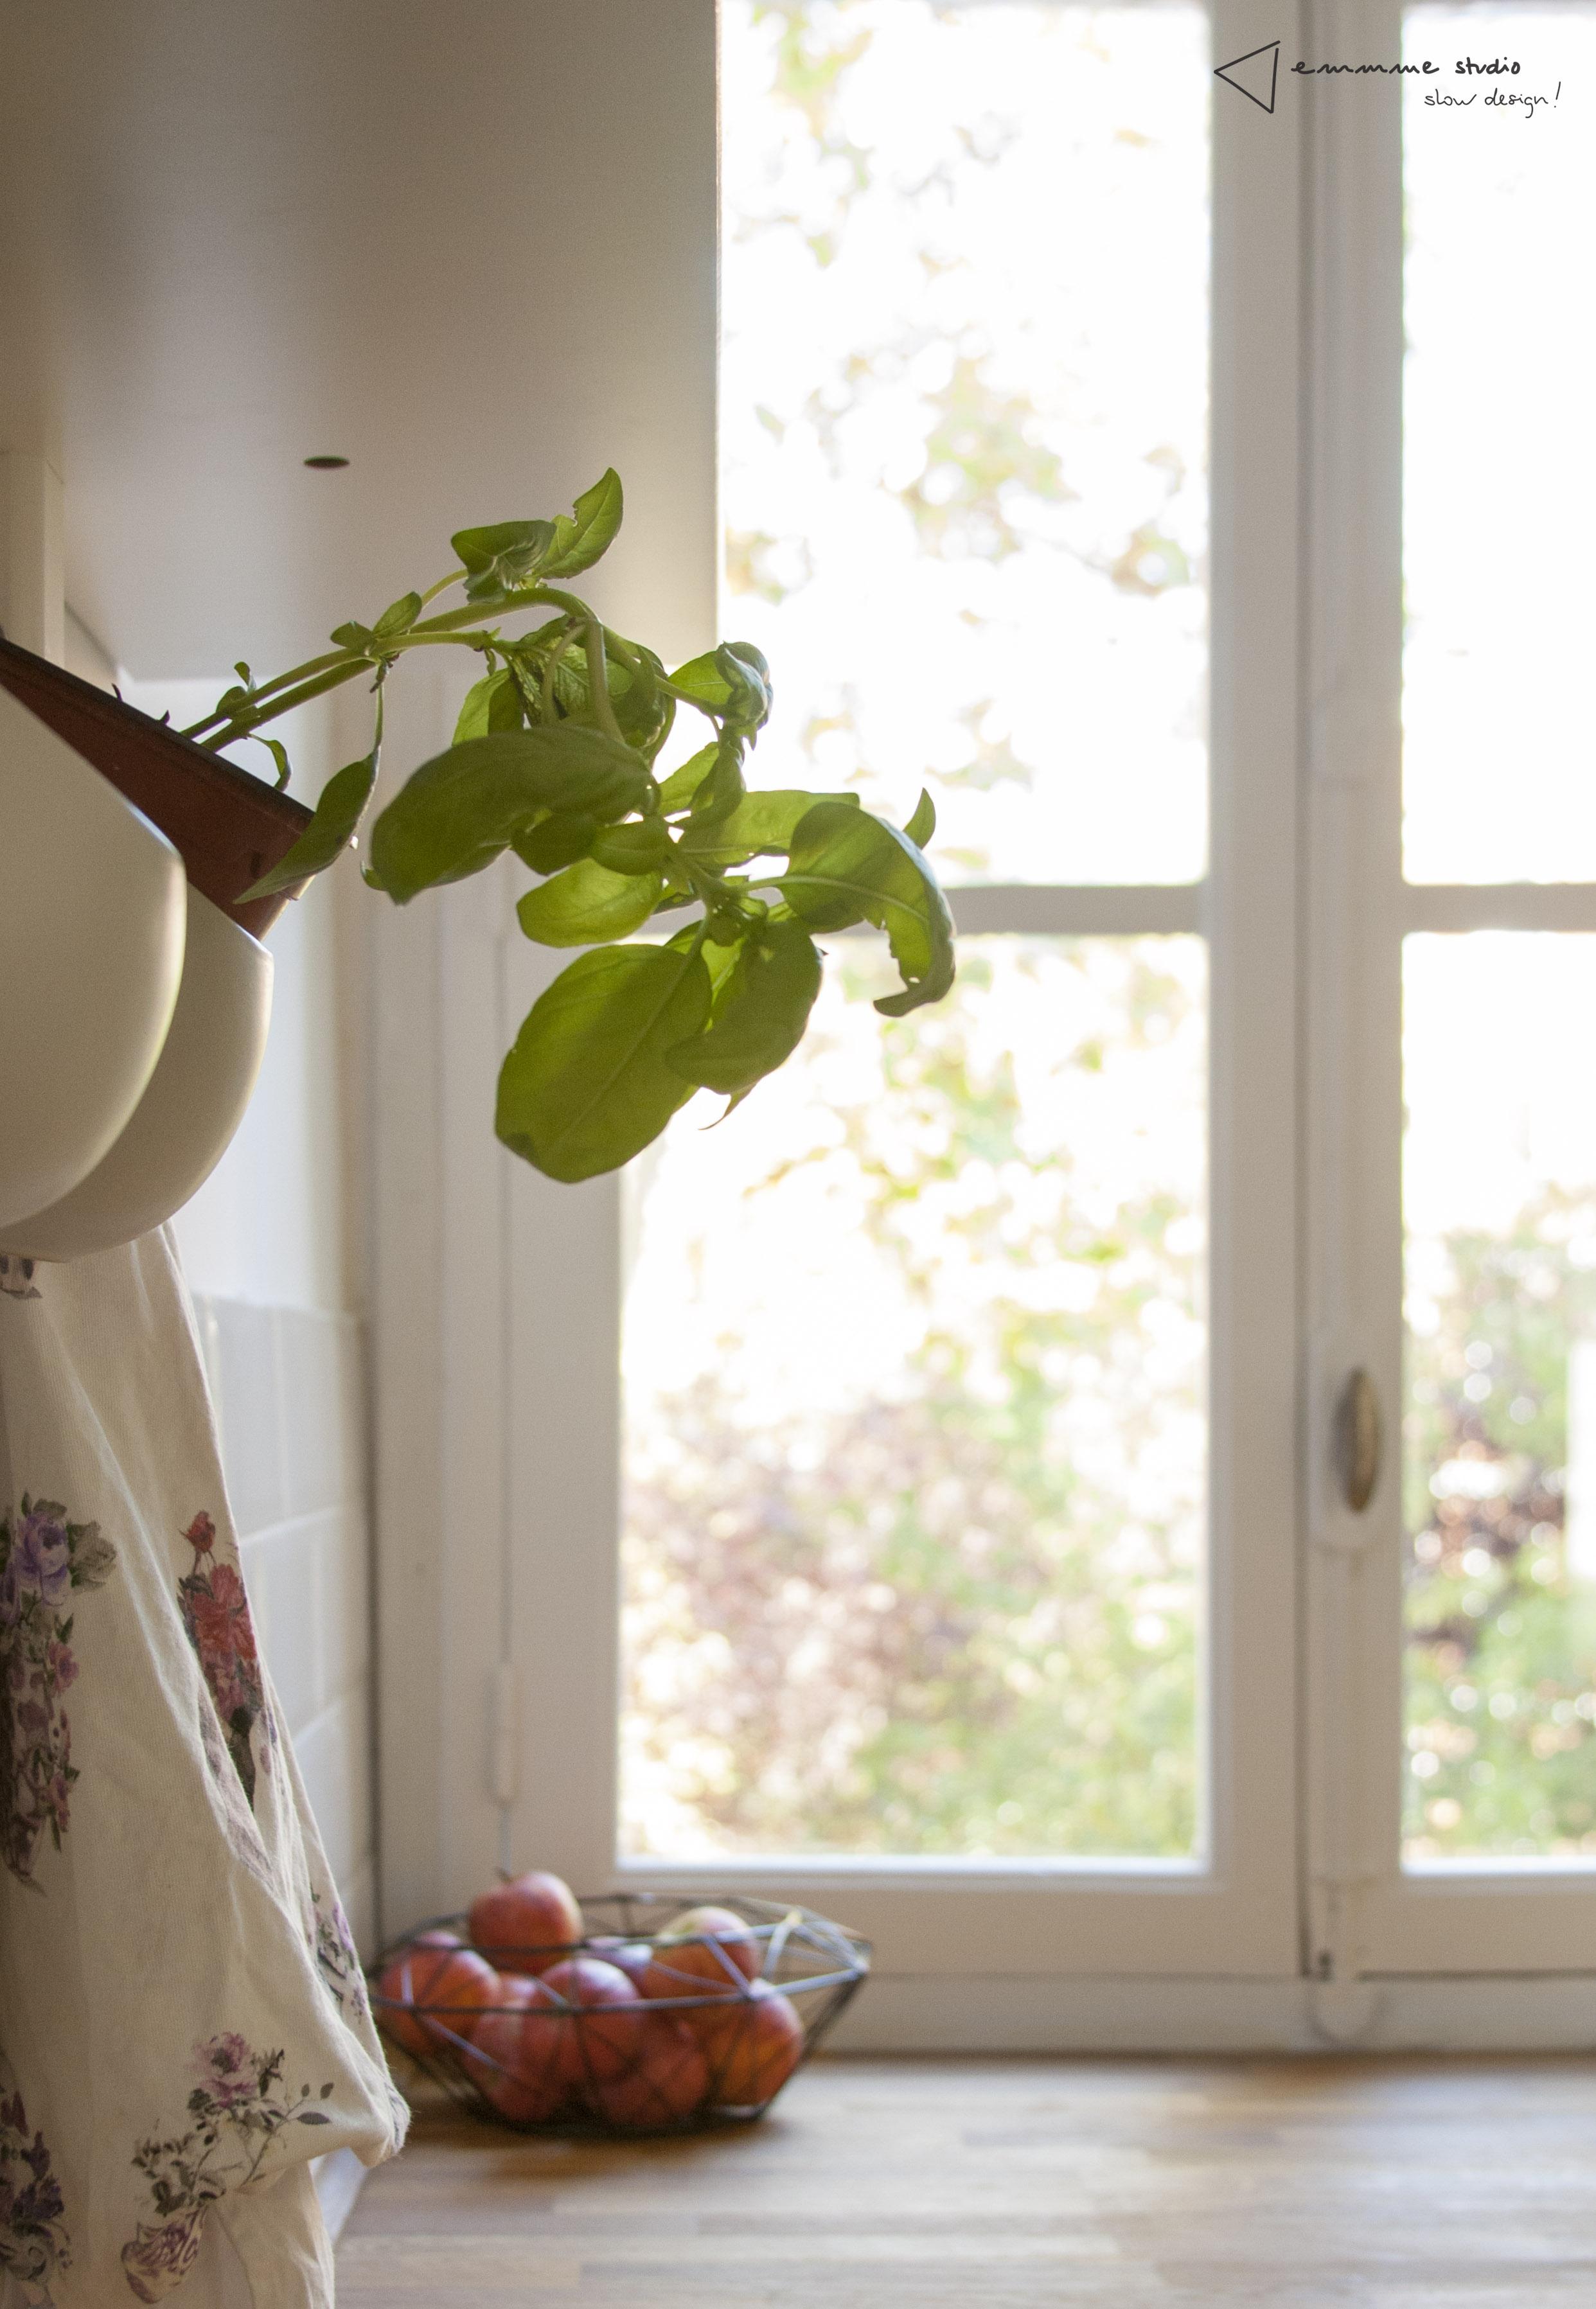 emmme studio_reforma new vintage_detalle cocina.jpg